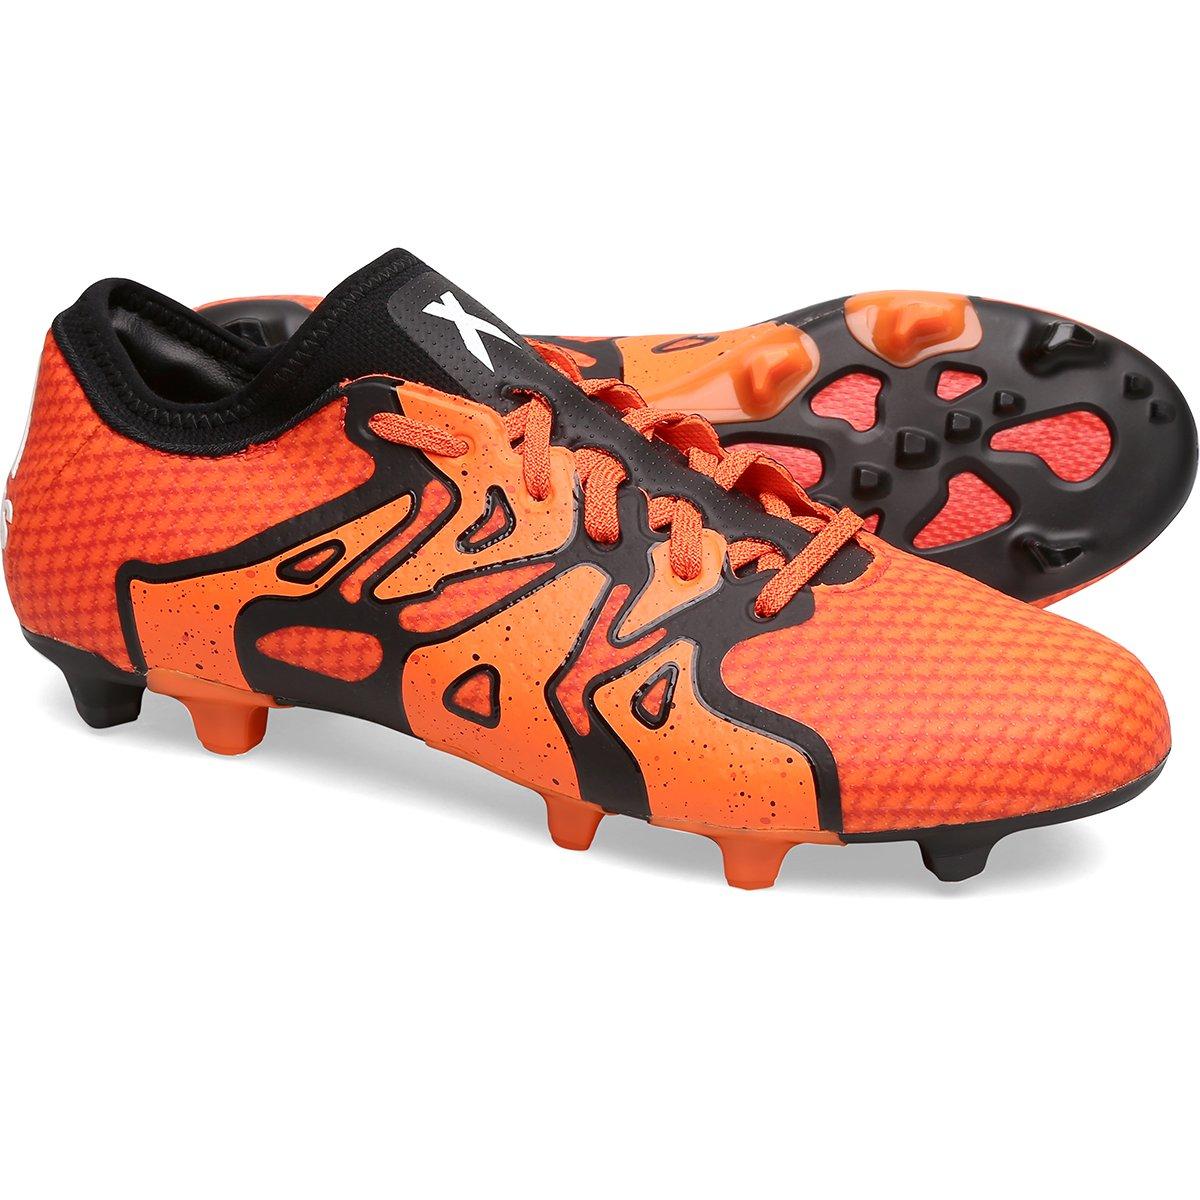 84cf3245ae Chuteira Adidas X 15.1 Primeknit FG Campo